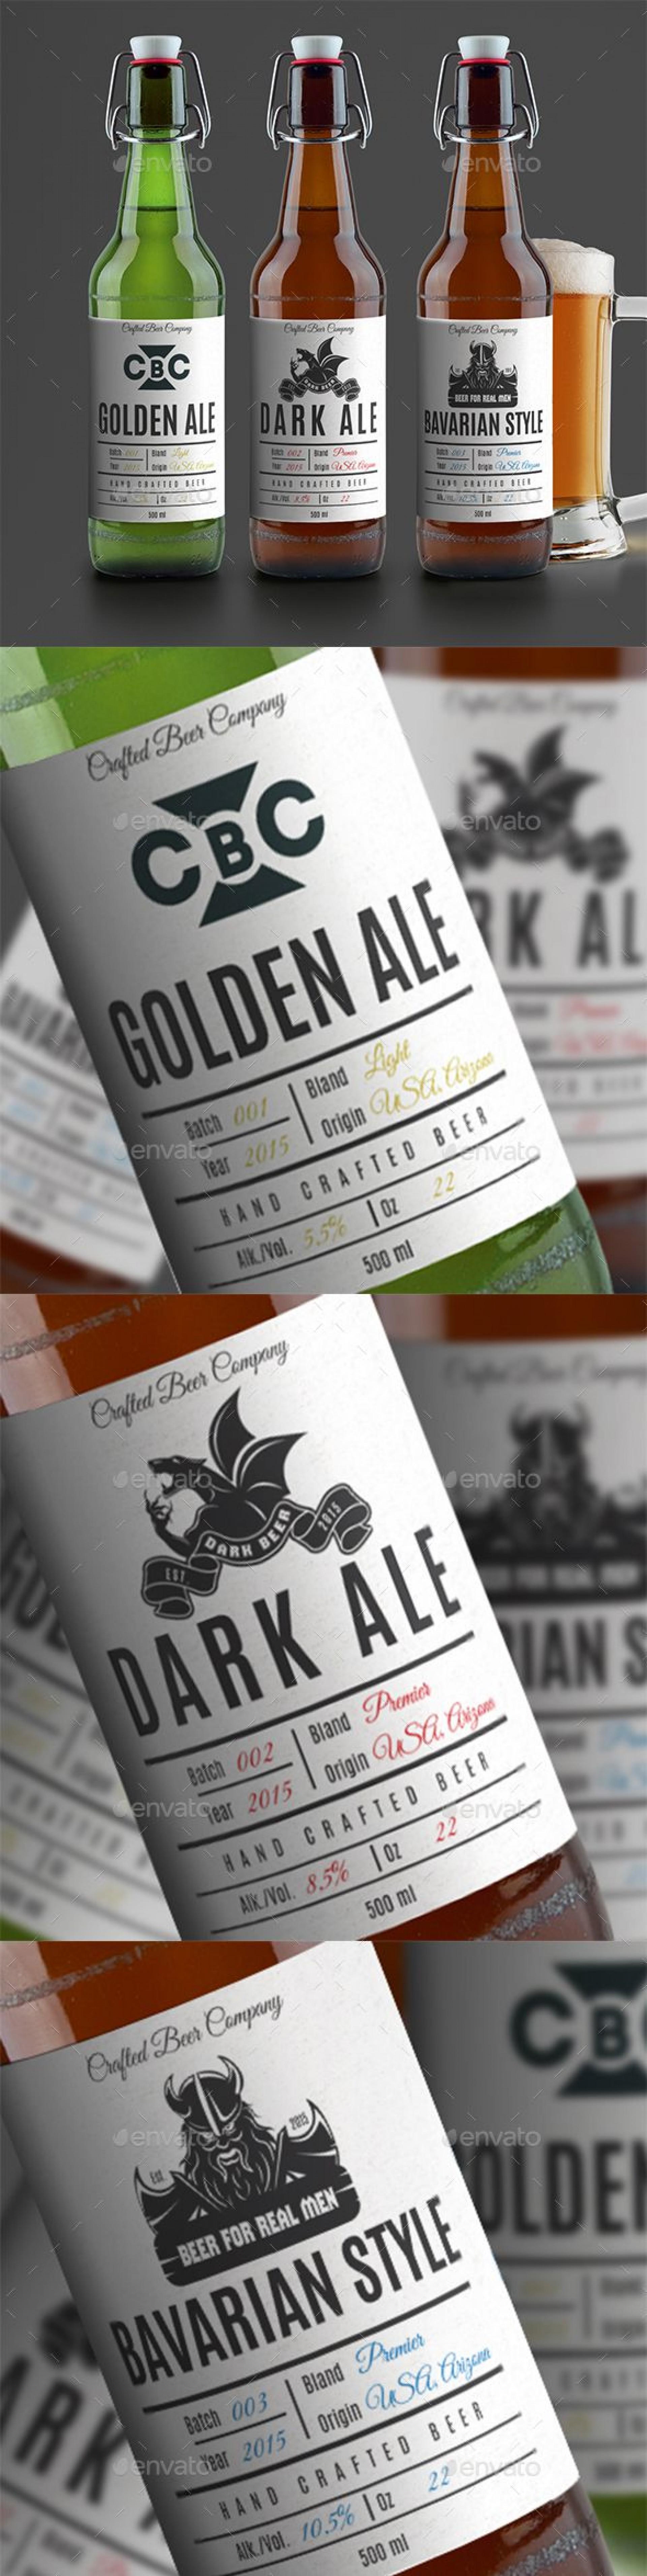 005 Fantastic Beer Bottle Label Template Word High Definition  Free1920